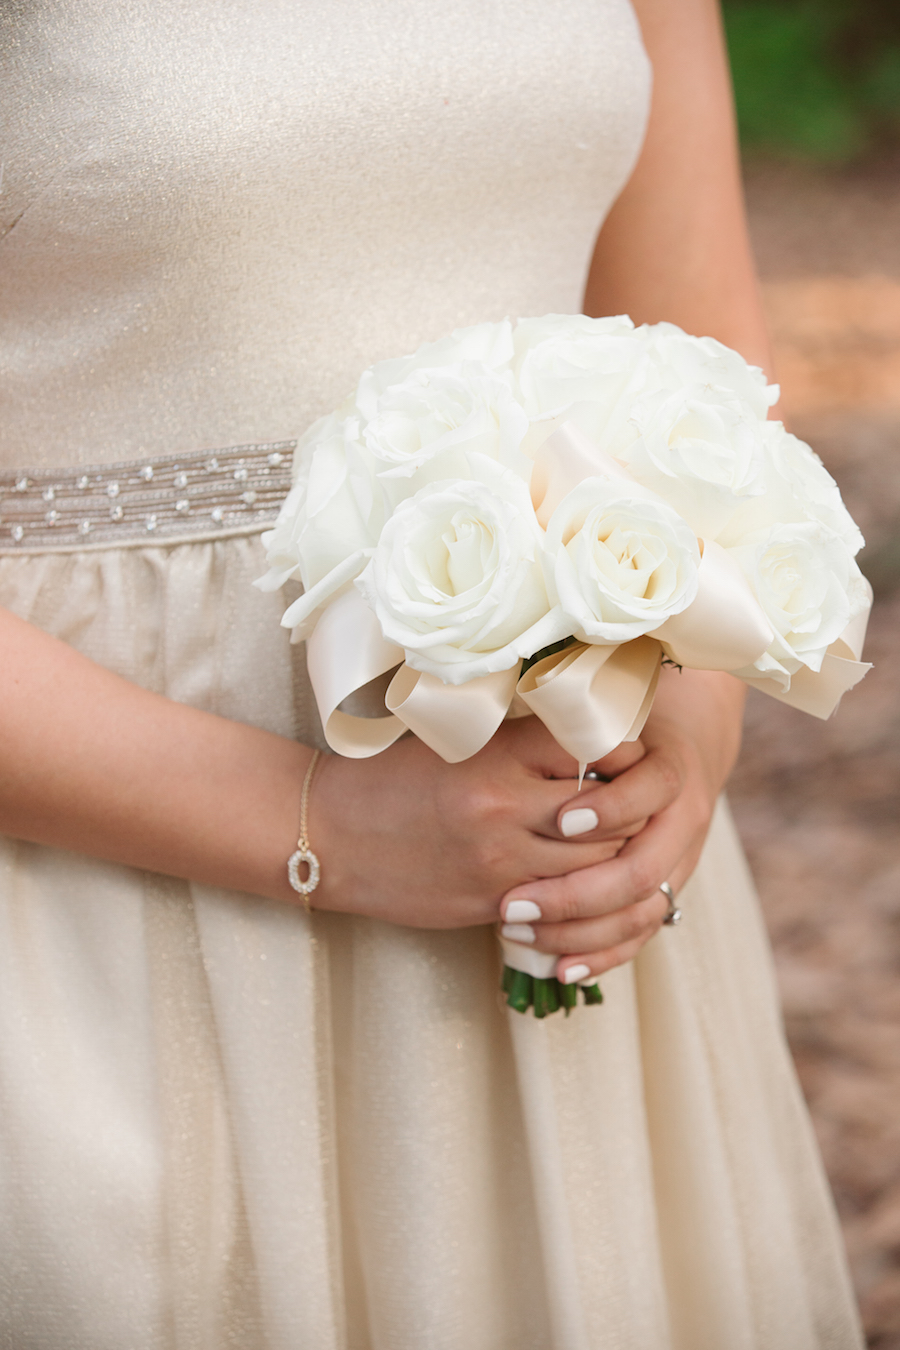 Ivory Rose Wedding Bouquet with Ivory Ribbon by Tampa Wedding Floral Designer Northside Florist